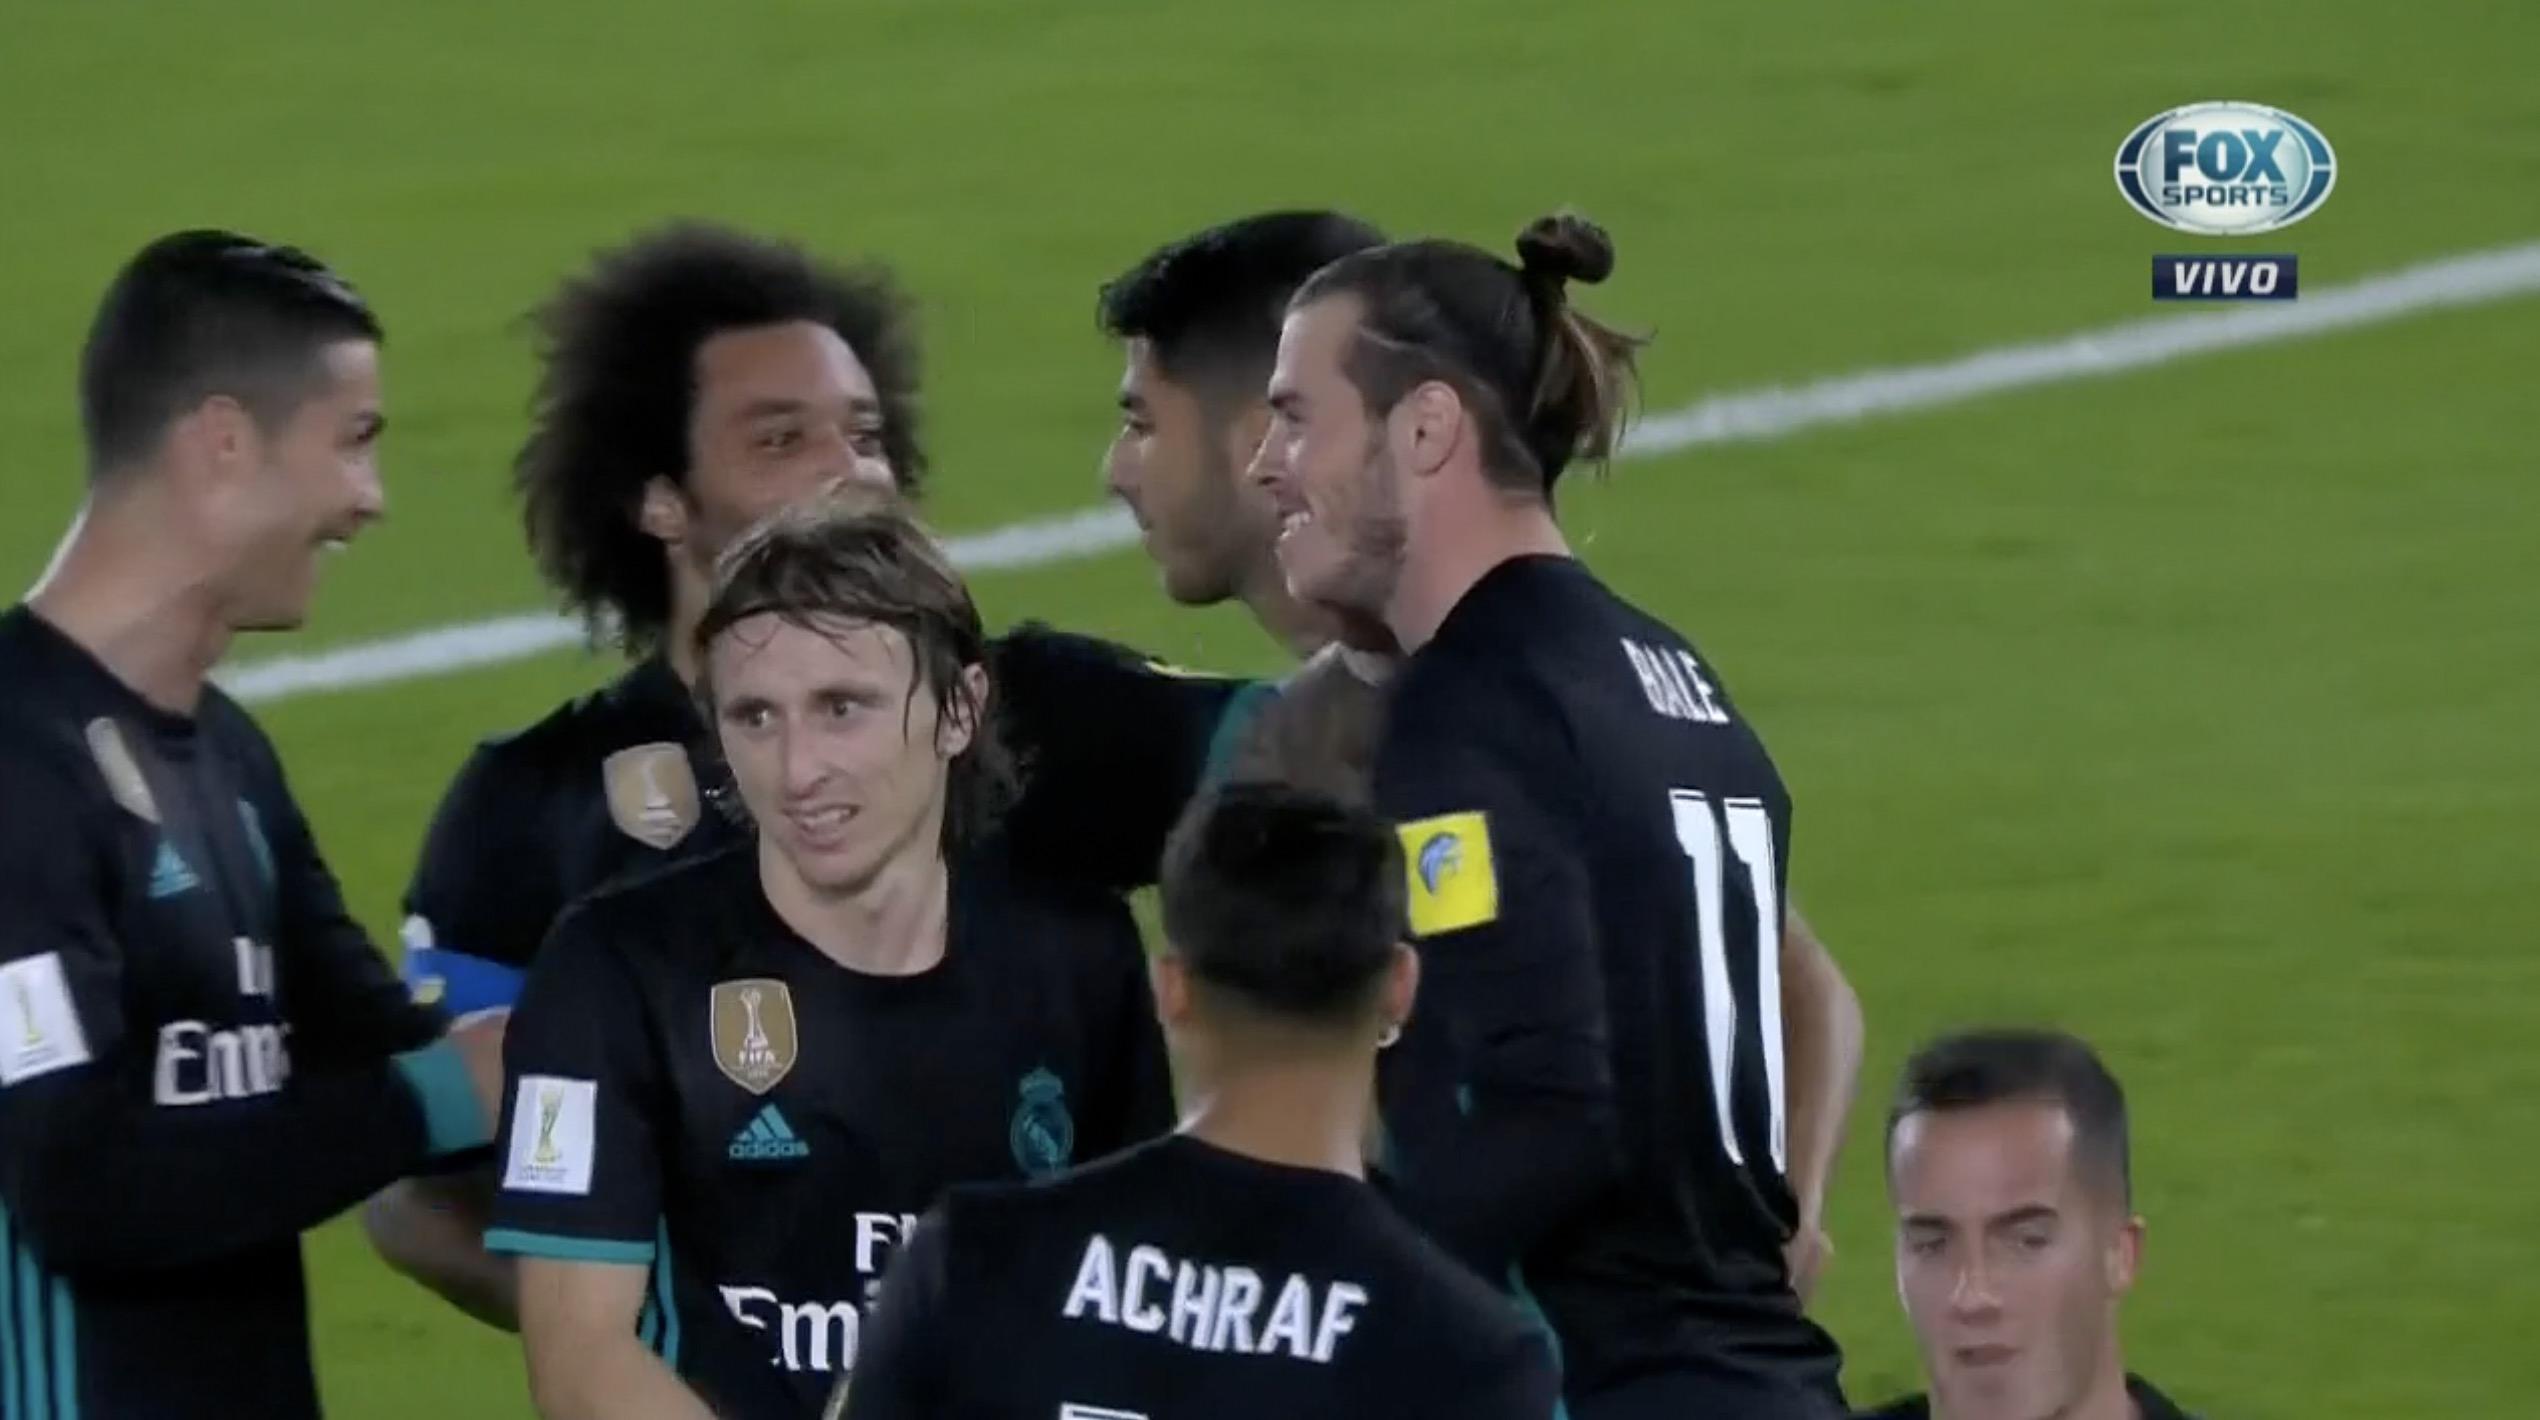 Apareció Bale para poner en ventaja al Real